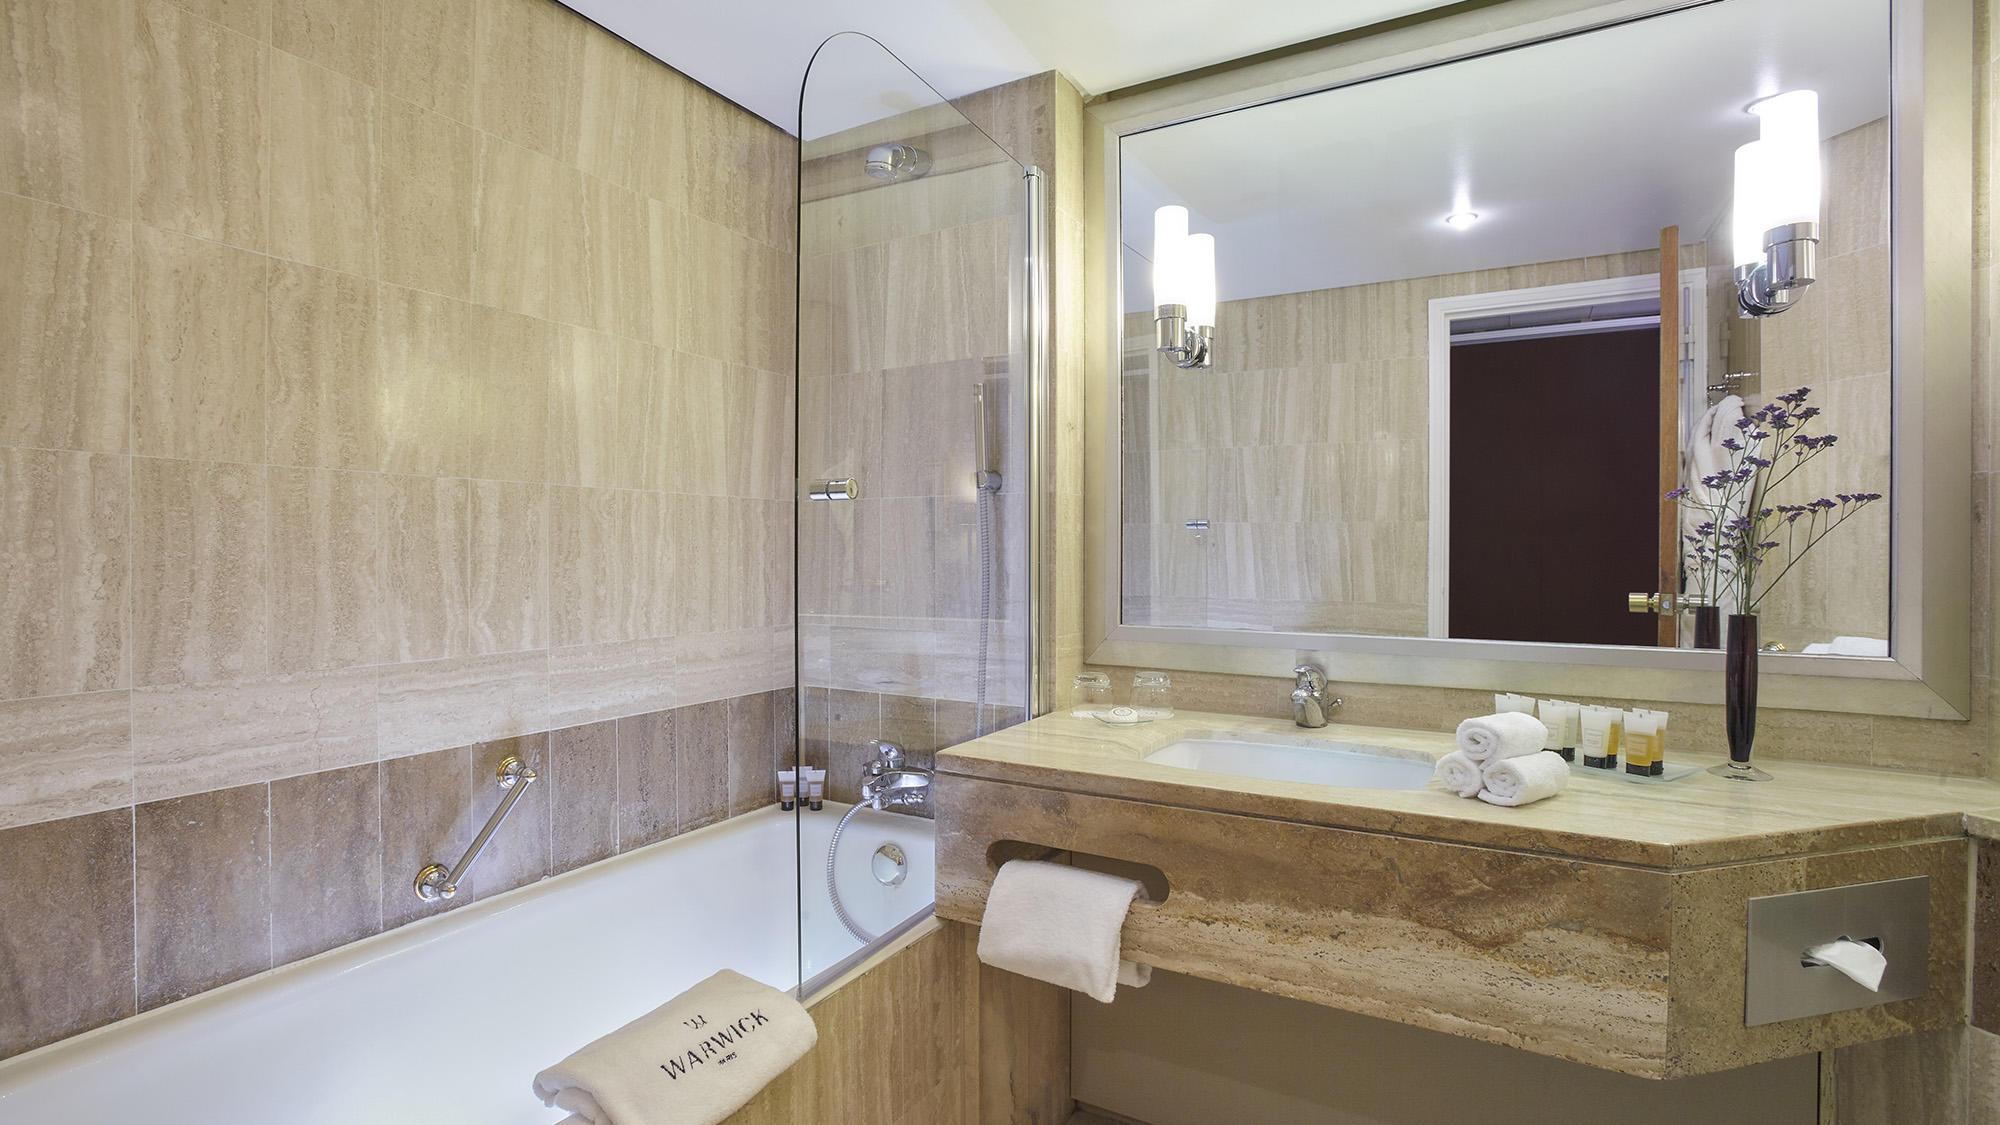 Bathroom with Mirror reflection at Warwick Paris